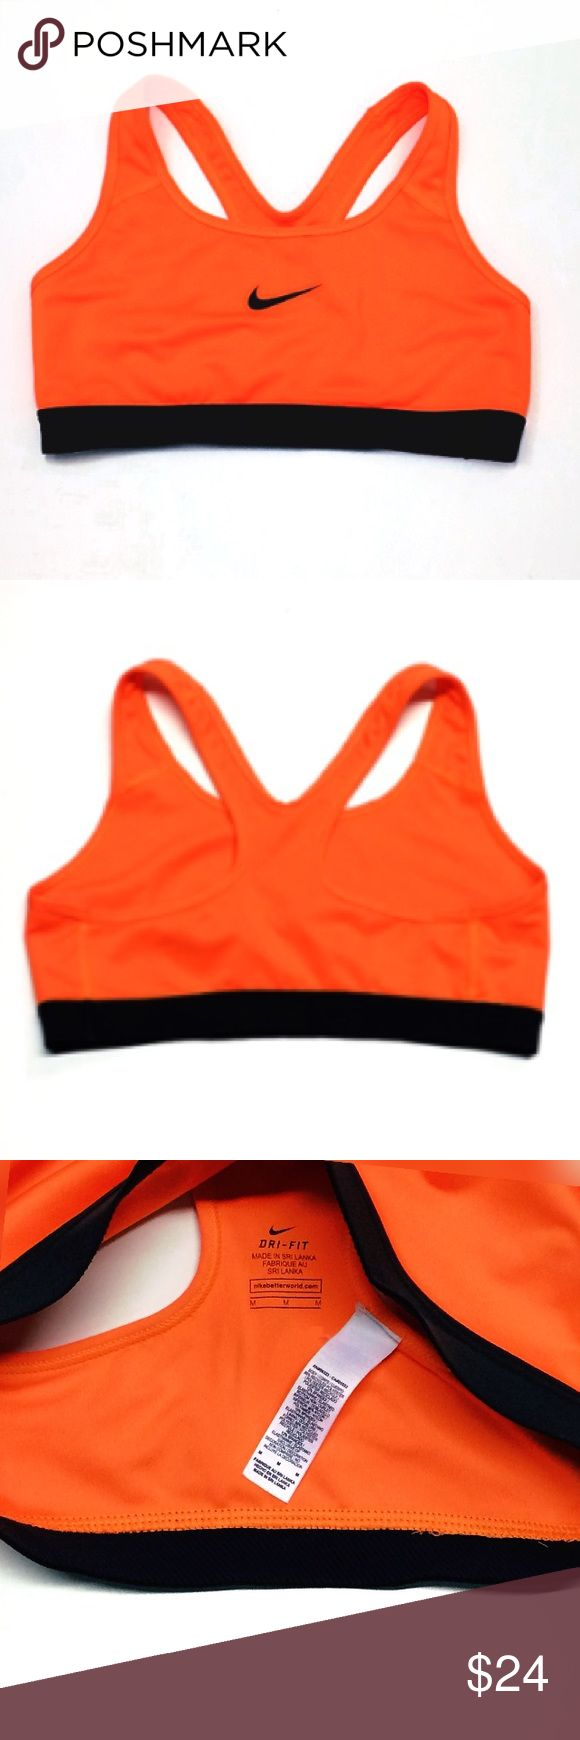 NIKE Dri-Fit Fluorescent Orange Sports BRA BRAND NEW!! Awesome FLUORESCENT Bright ORANGE-Neon Orange Color!! Size: M Nike Intimates & Sleepwear Bras